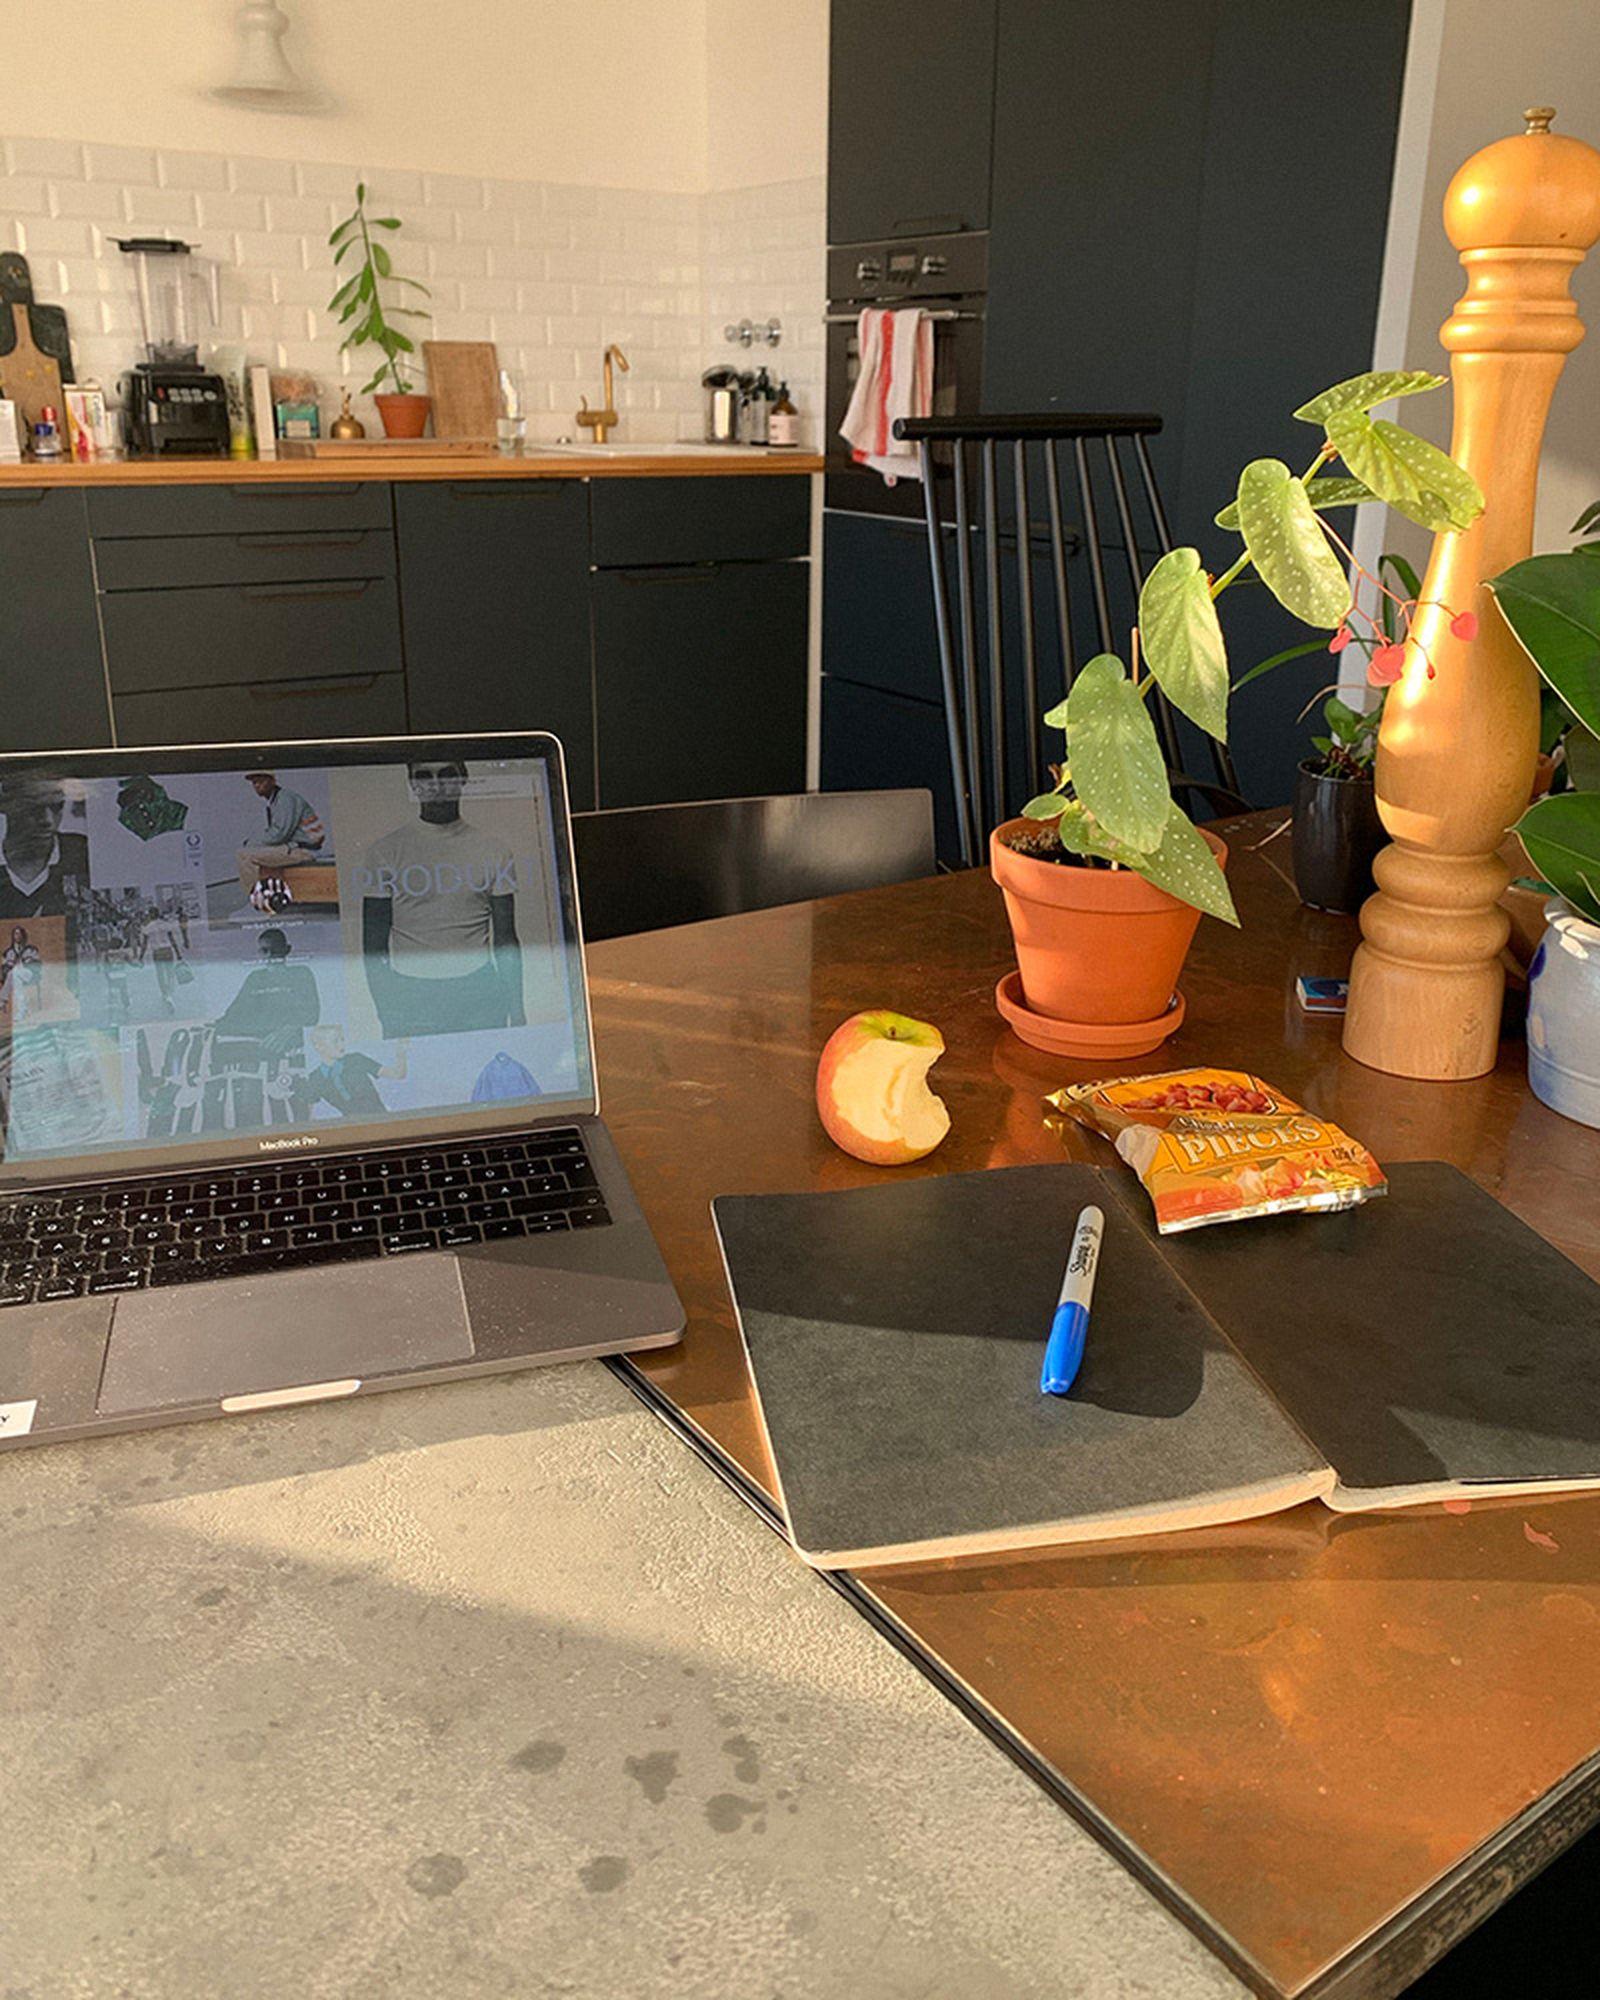 wfh-office-tour-look-inside-home-offices-herbert-01